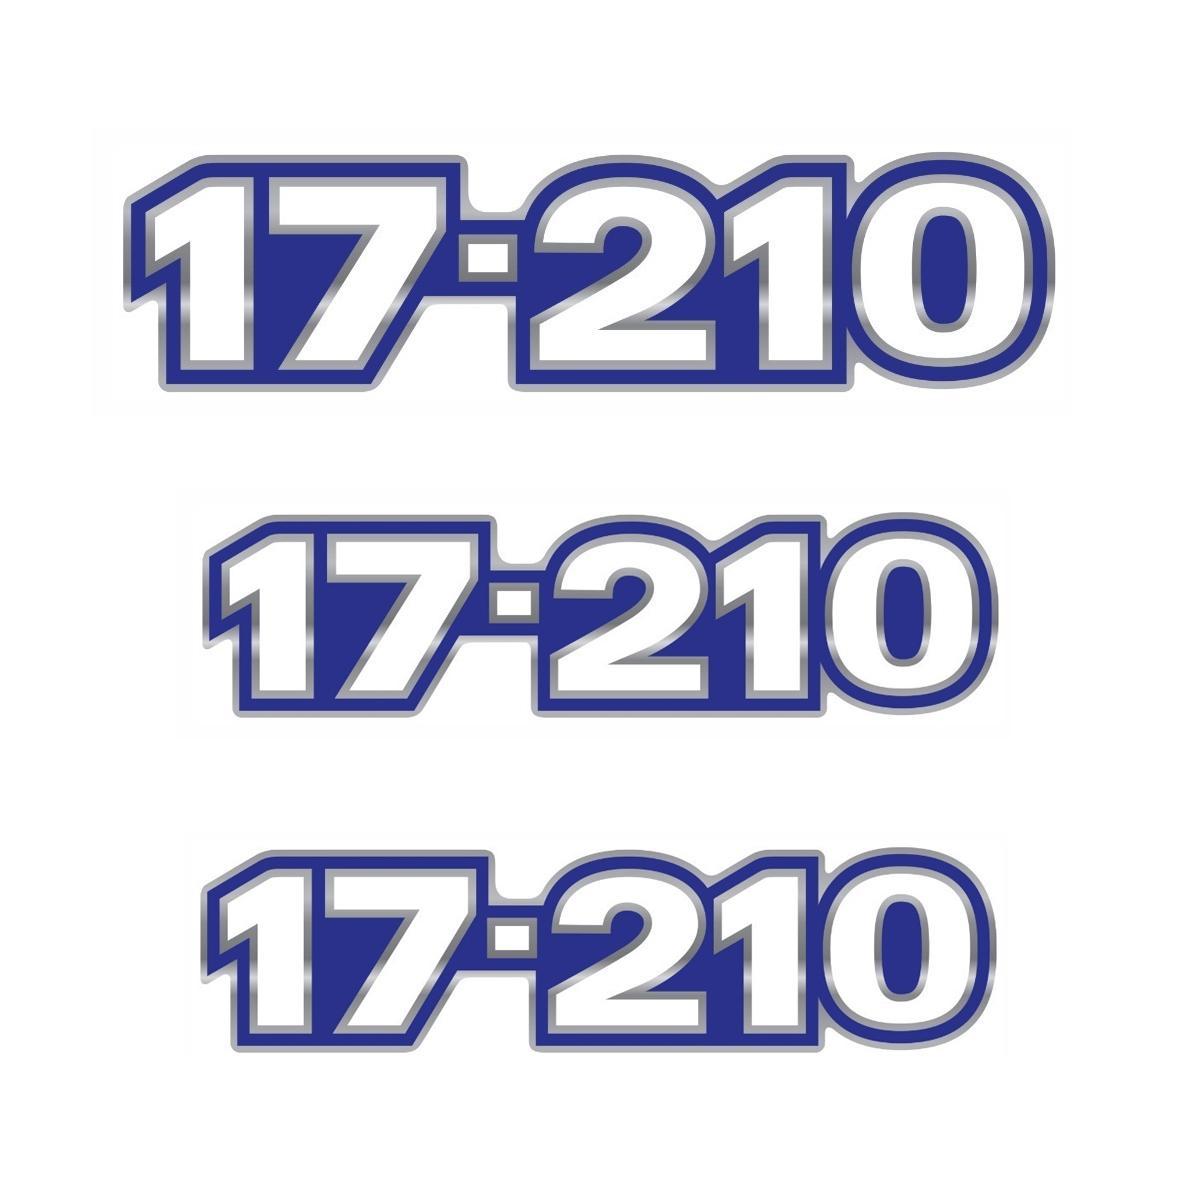 Emblema Caminhão Vw 17210 - Kit